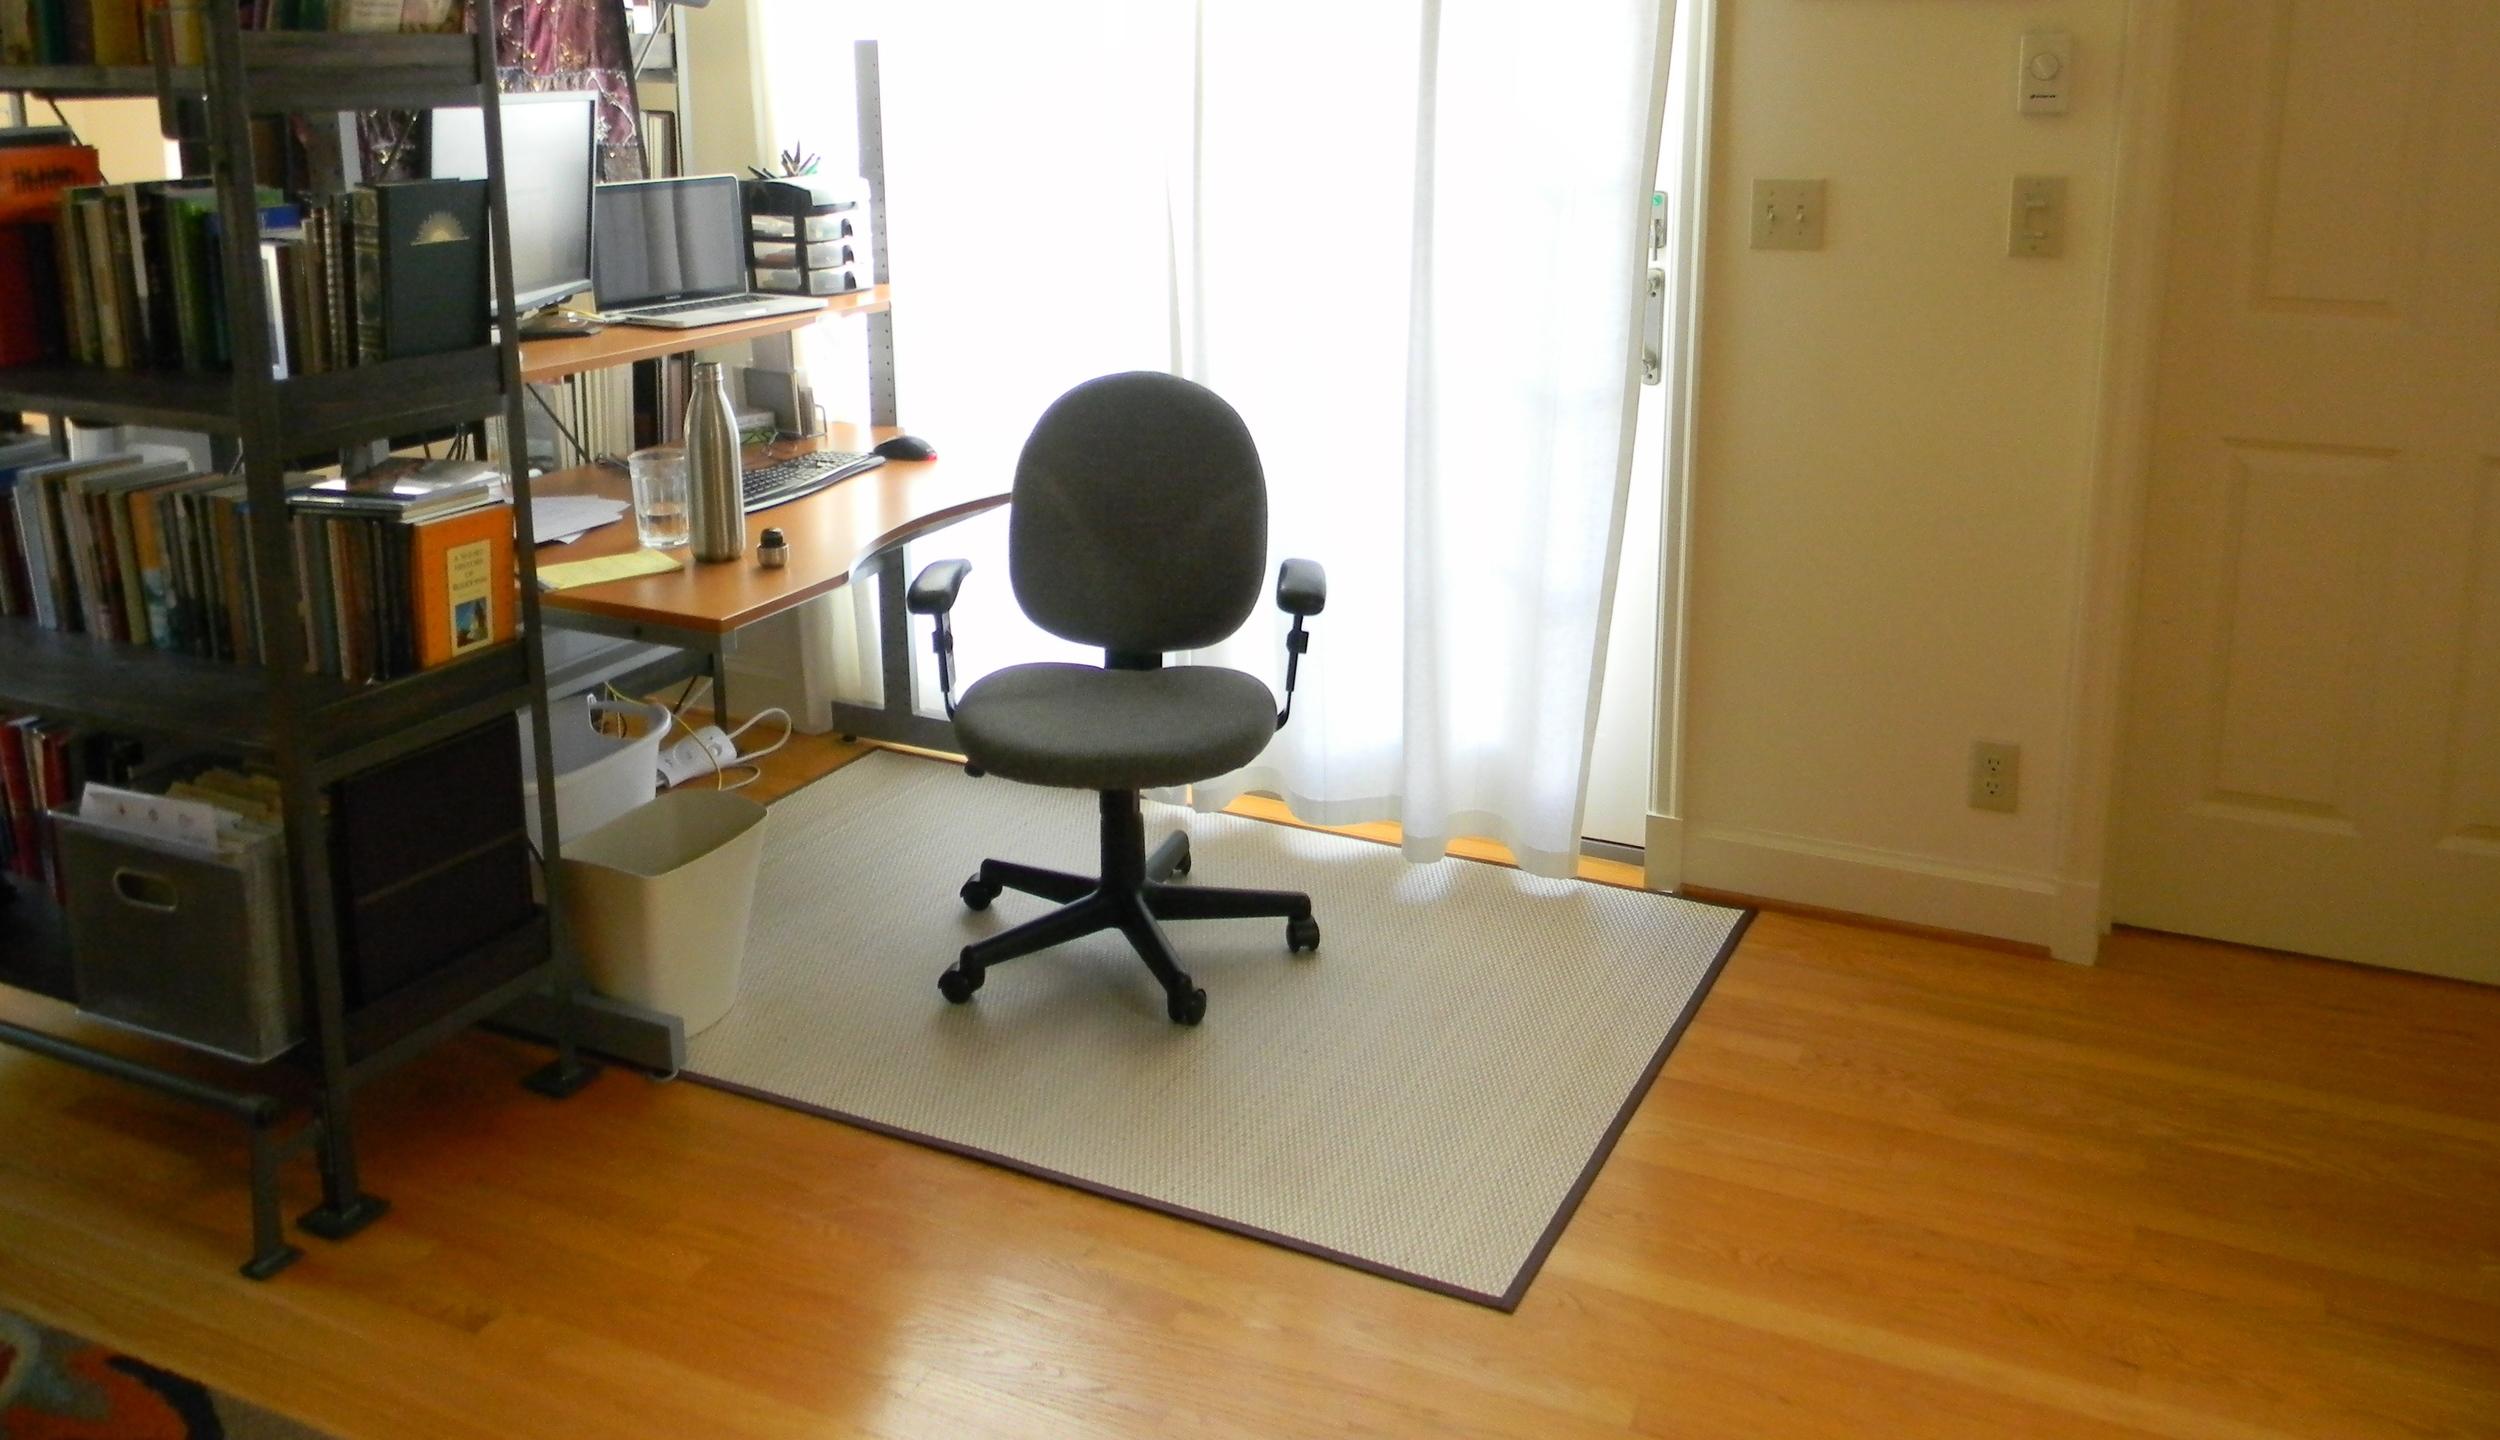 Room-dividing bookshelves, put into an L-shape, making a nook for a desk on one side...